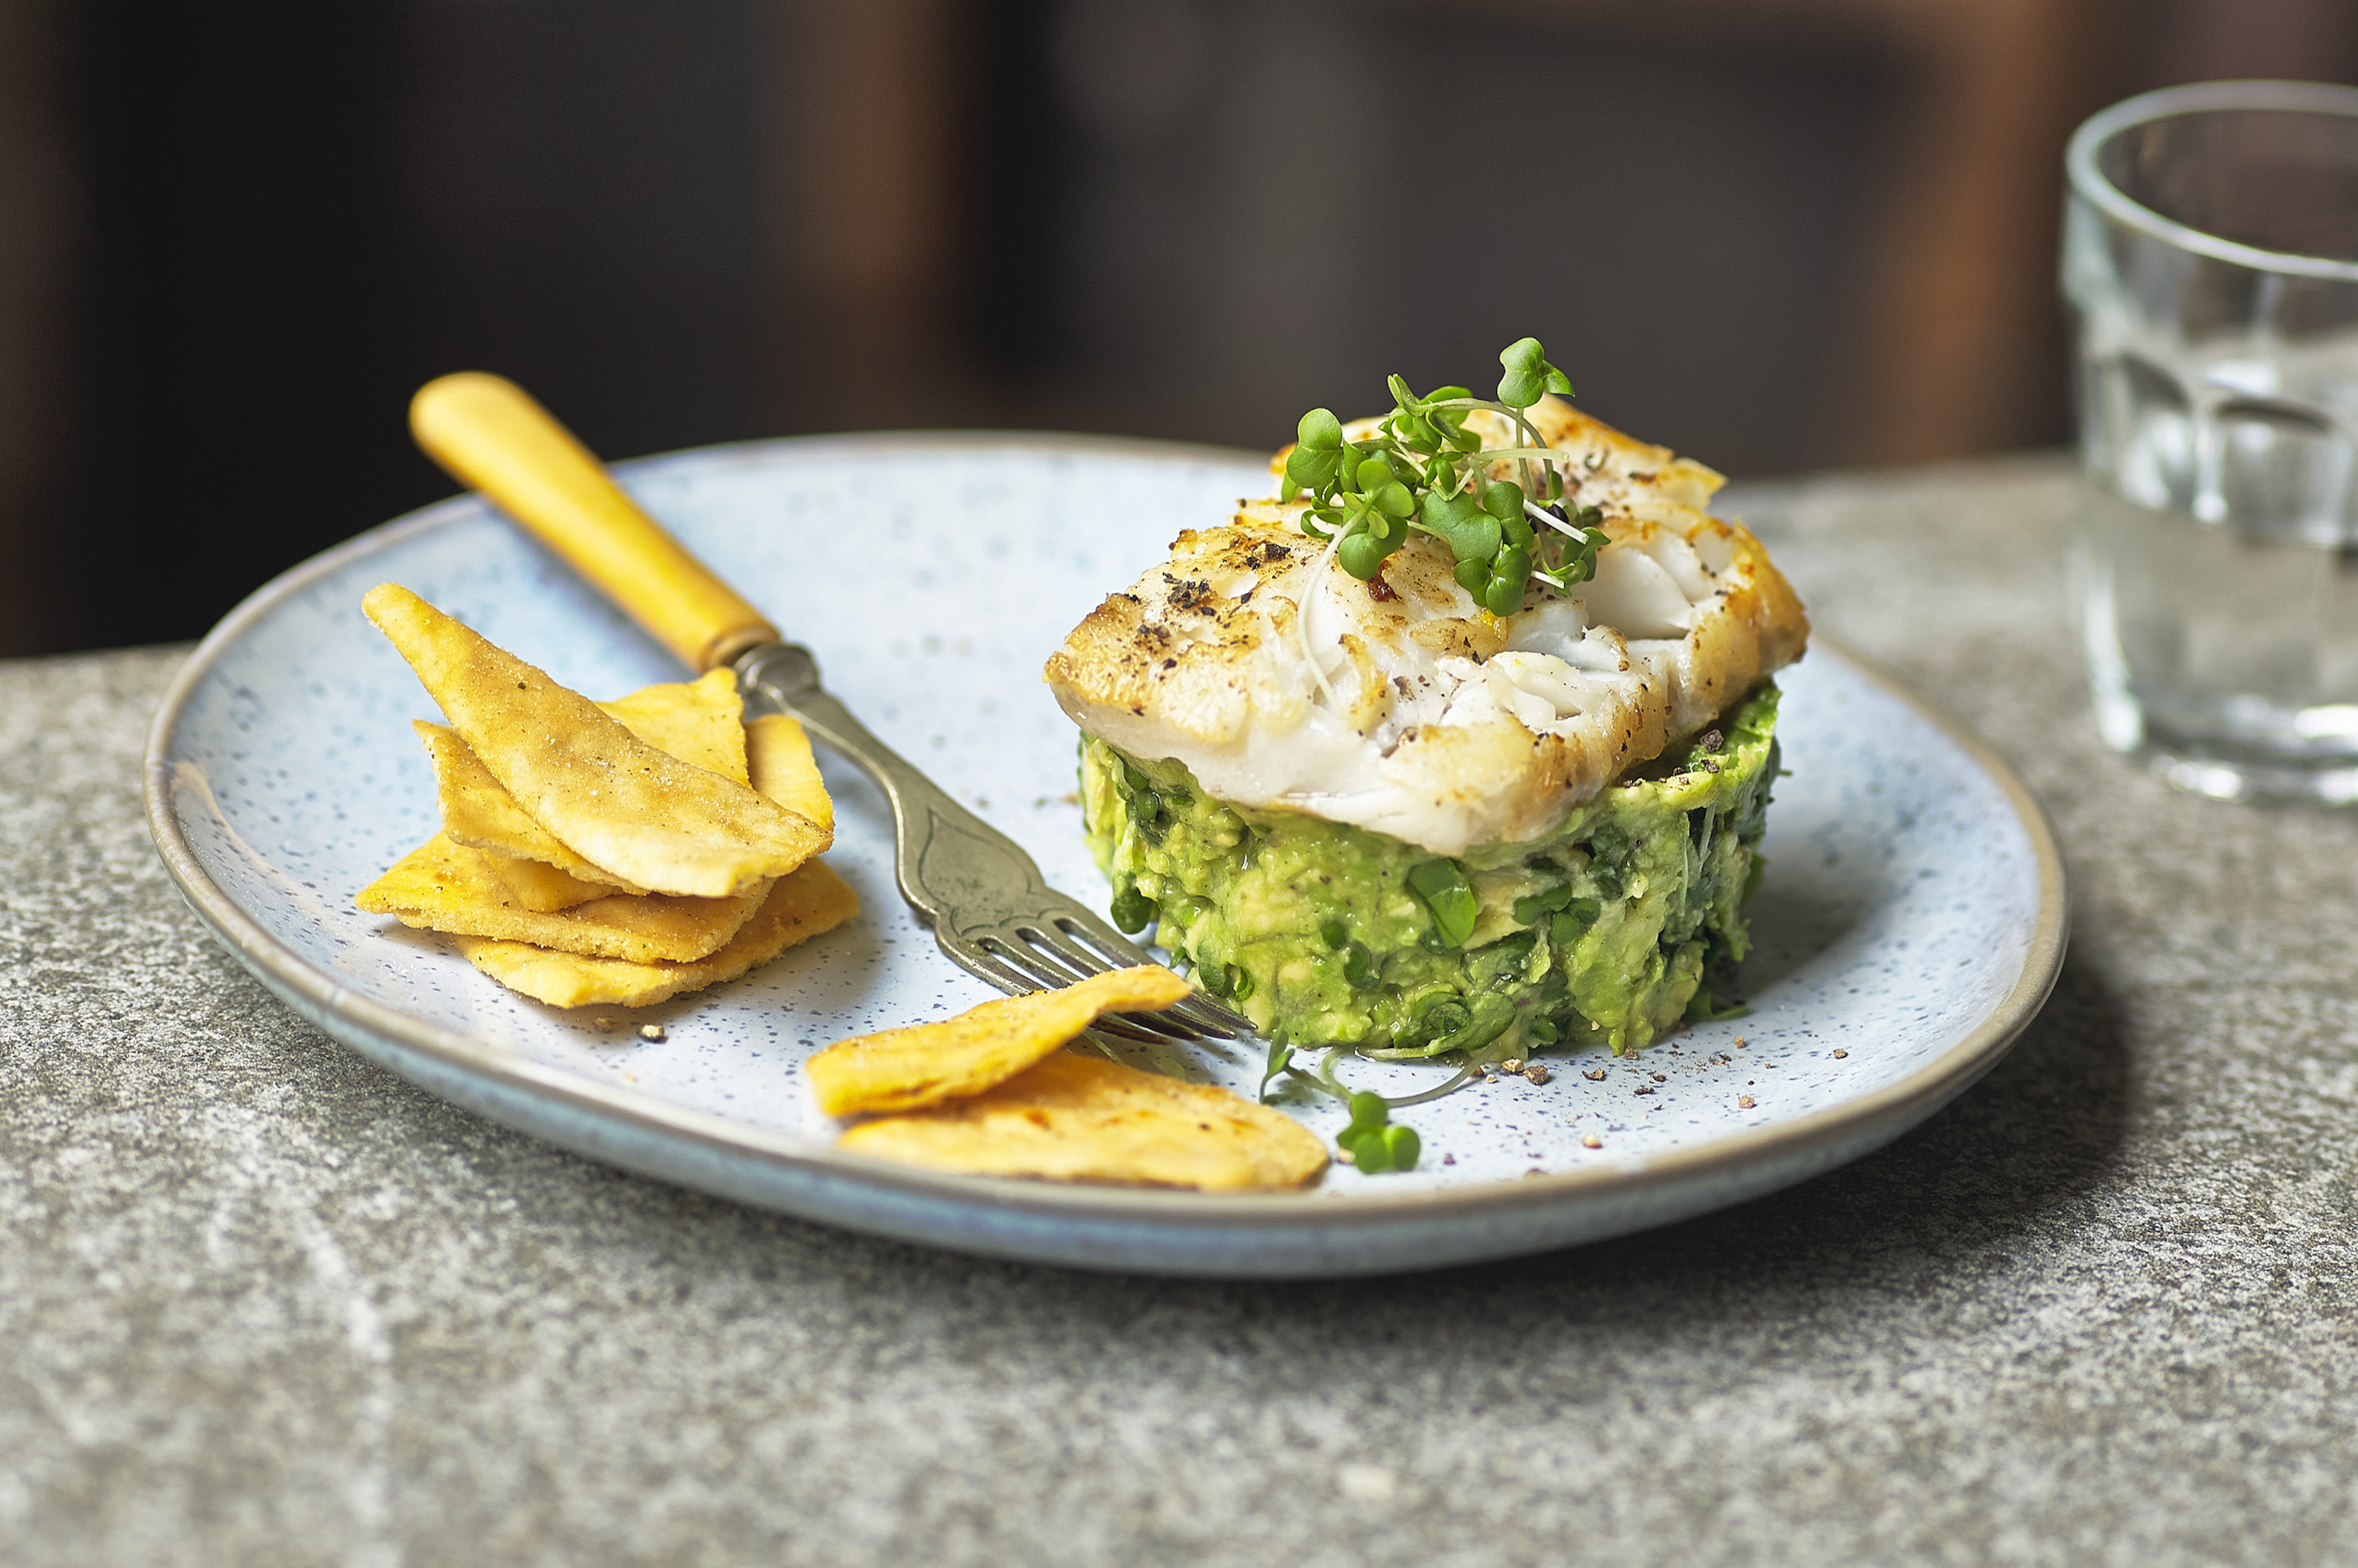 Salad Cress, Avocado Tartare with Pan Fried Cod